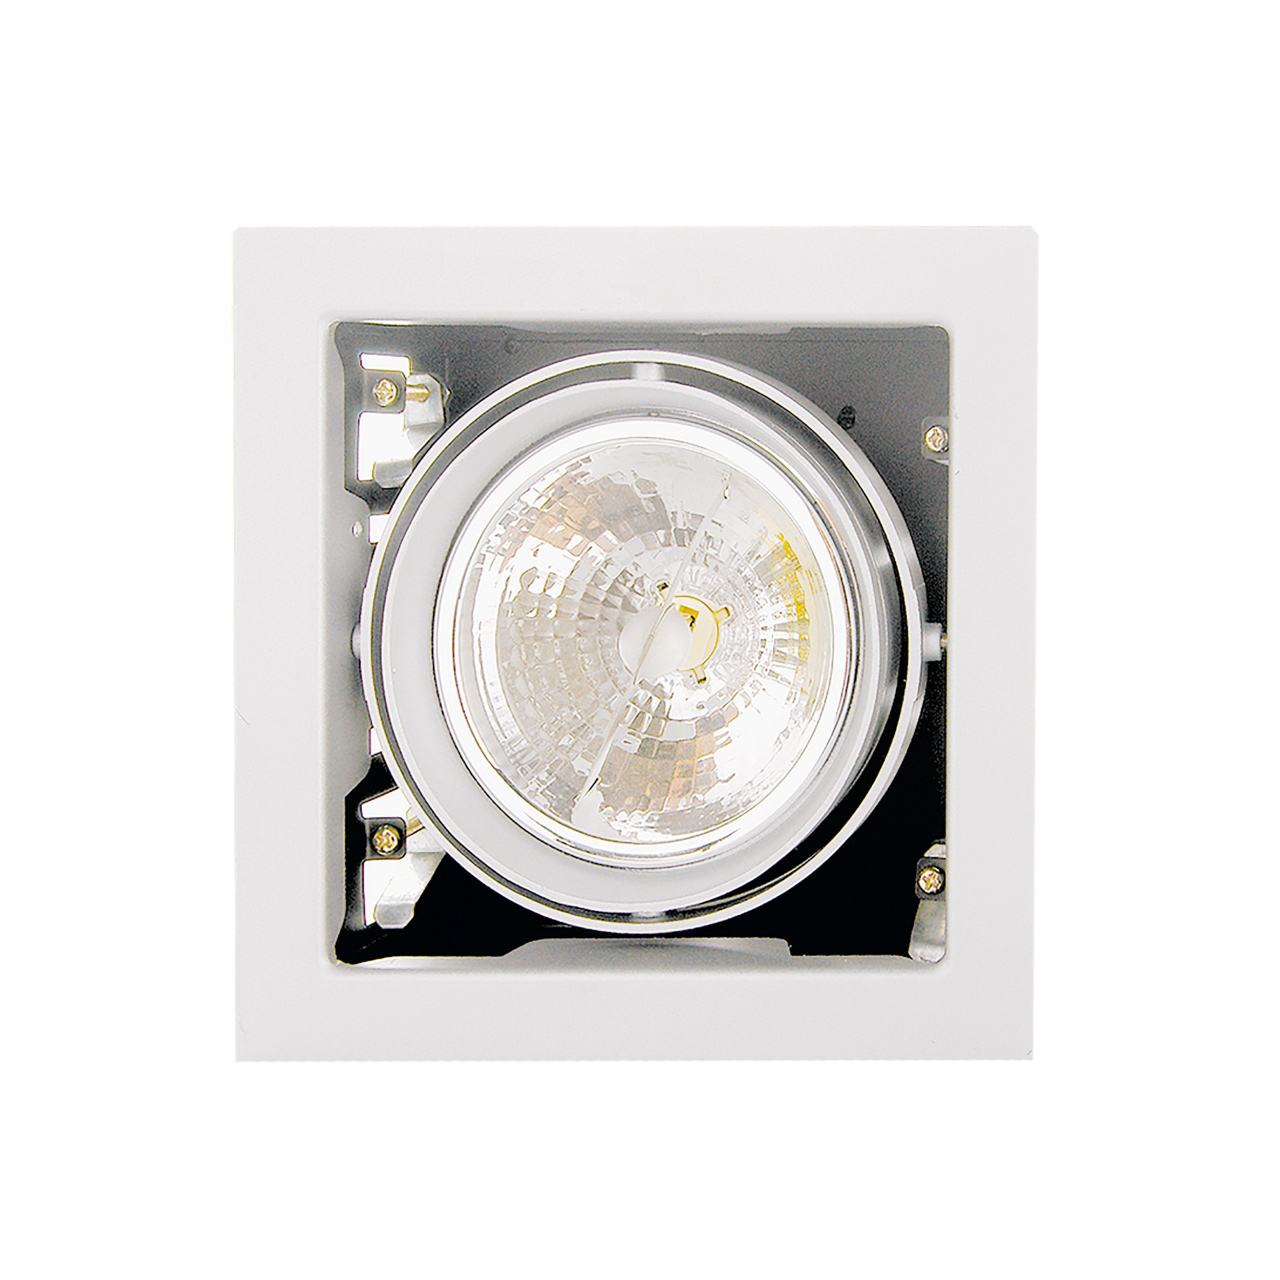 Светильник Cardano 111Х1 белый Lightstar 214110